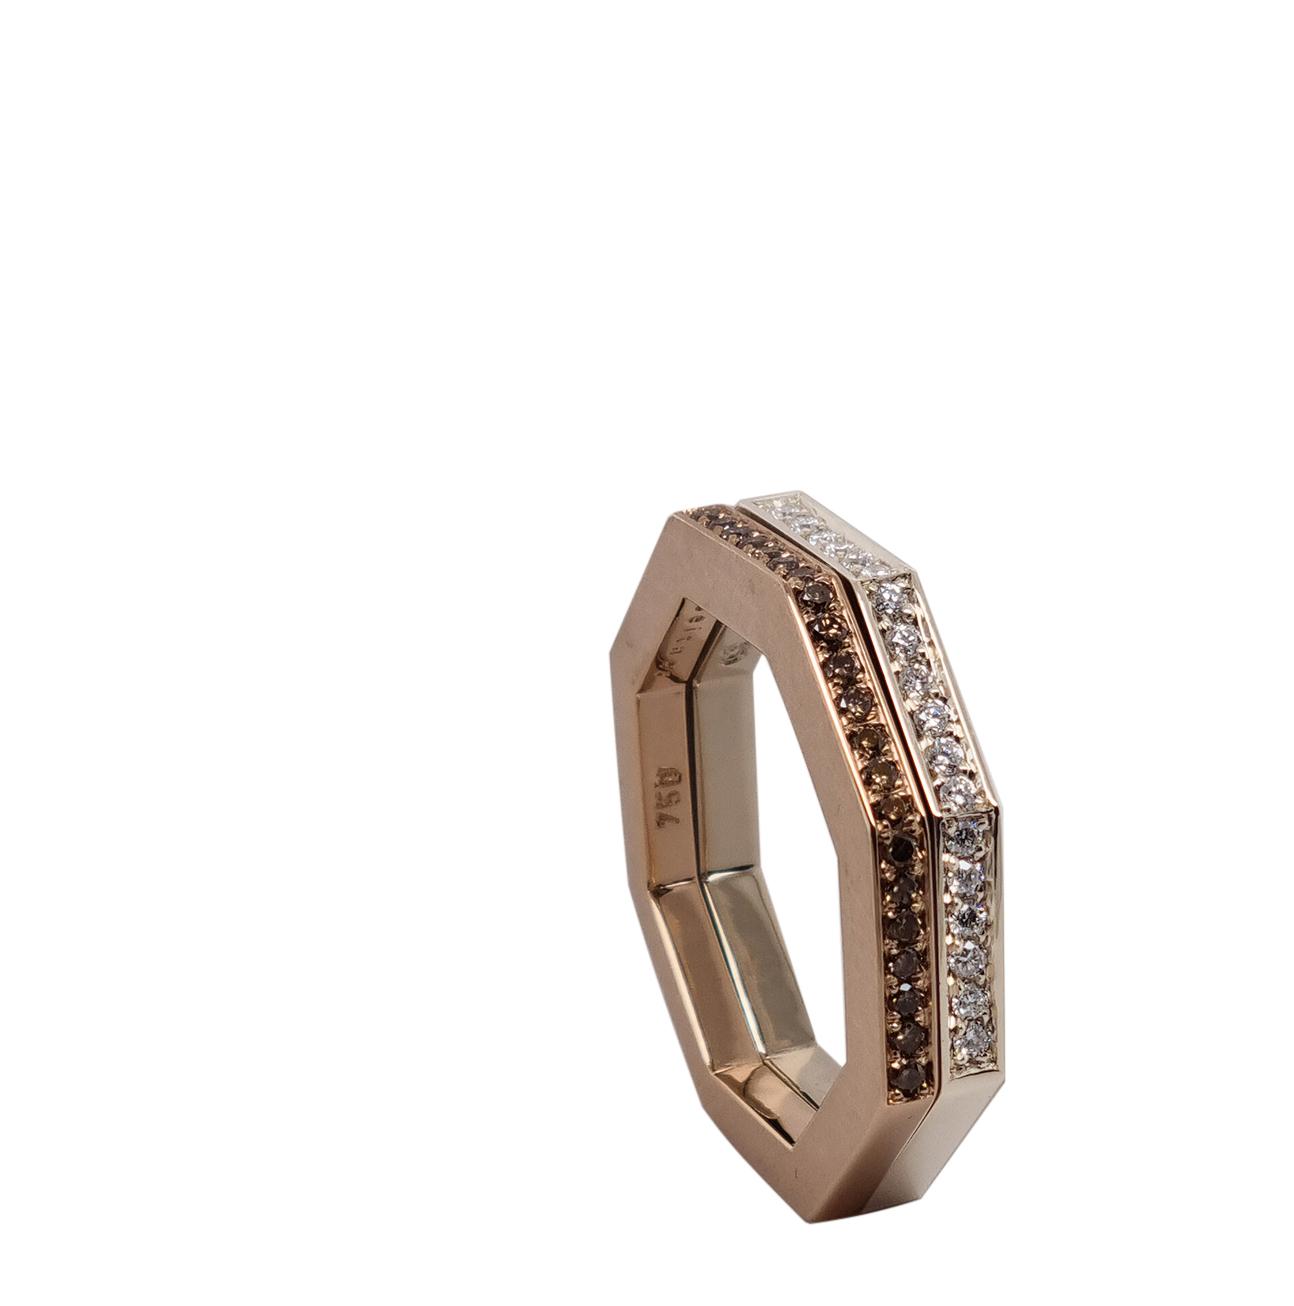 Ring aus 18 karat Weißgold, 0,13 carat Diamanten, 1.300 Euro, Ring aus 18 karat Rotgold, 0,15 carat braune Diamanten, 1.130 Euro